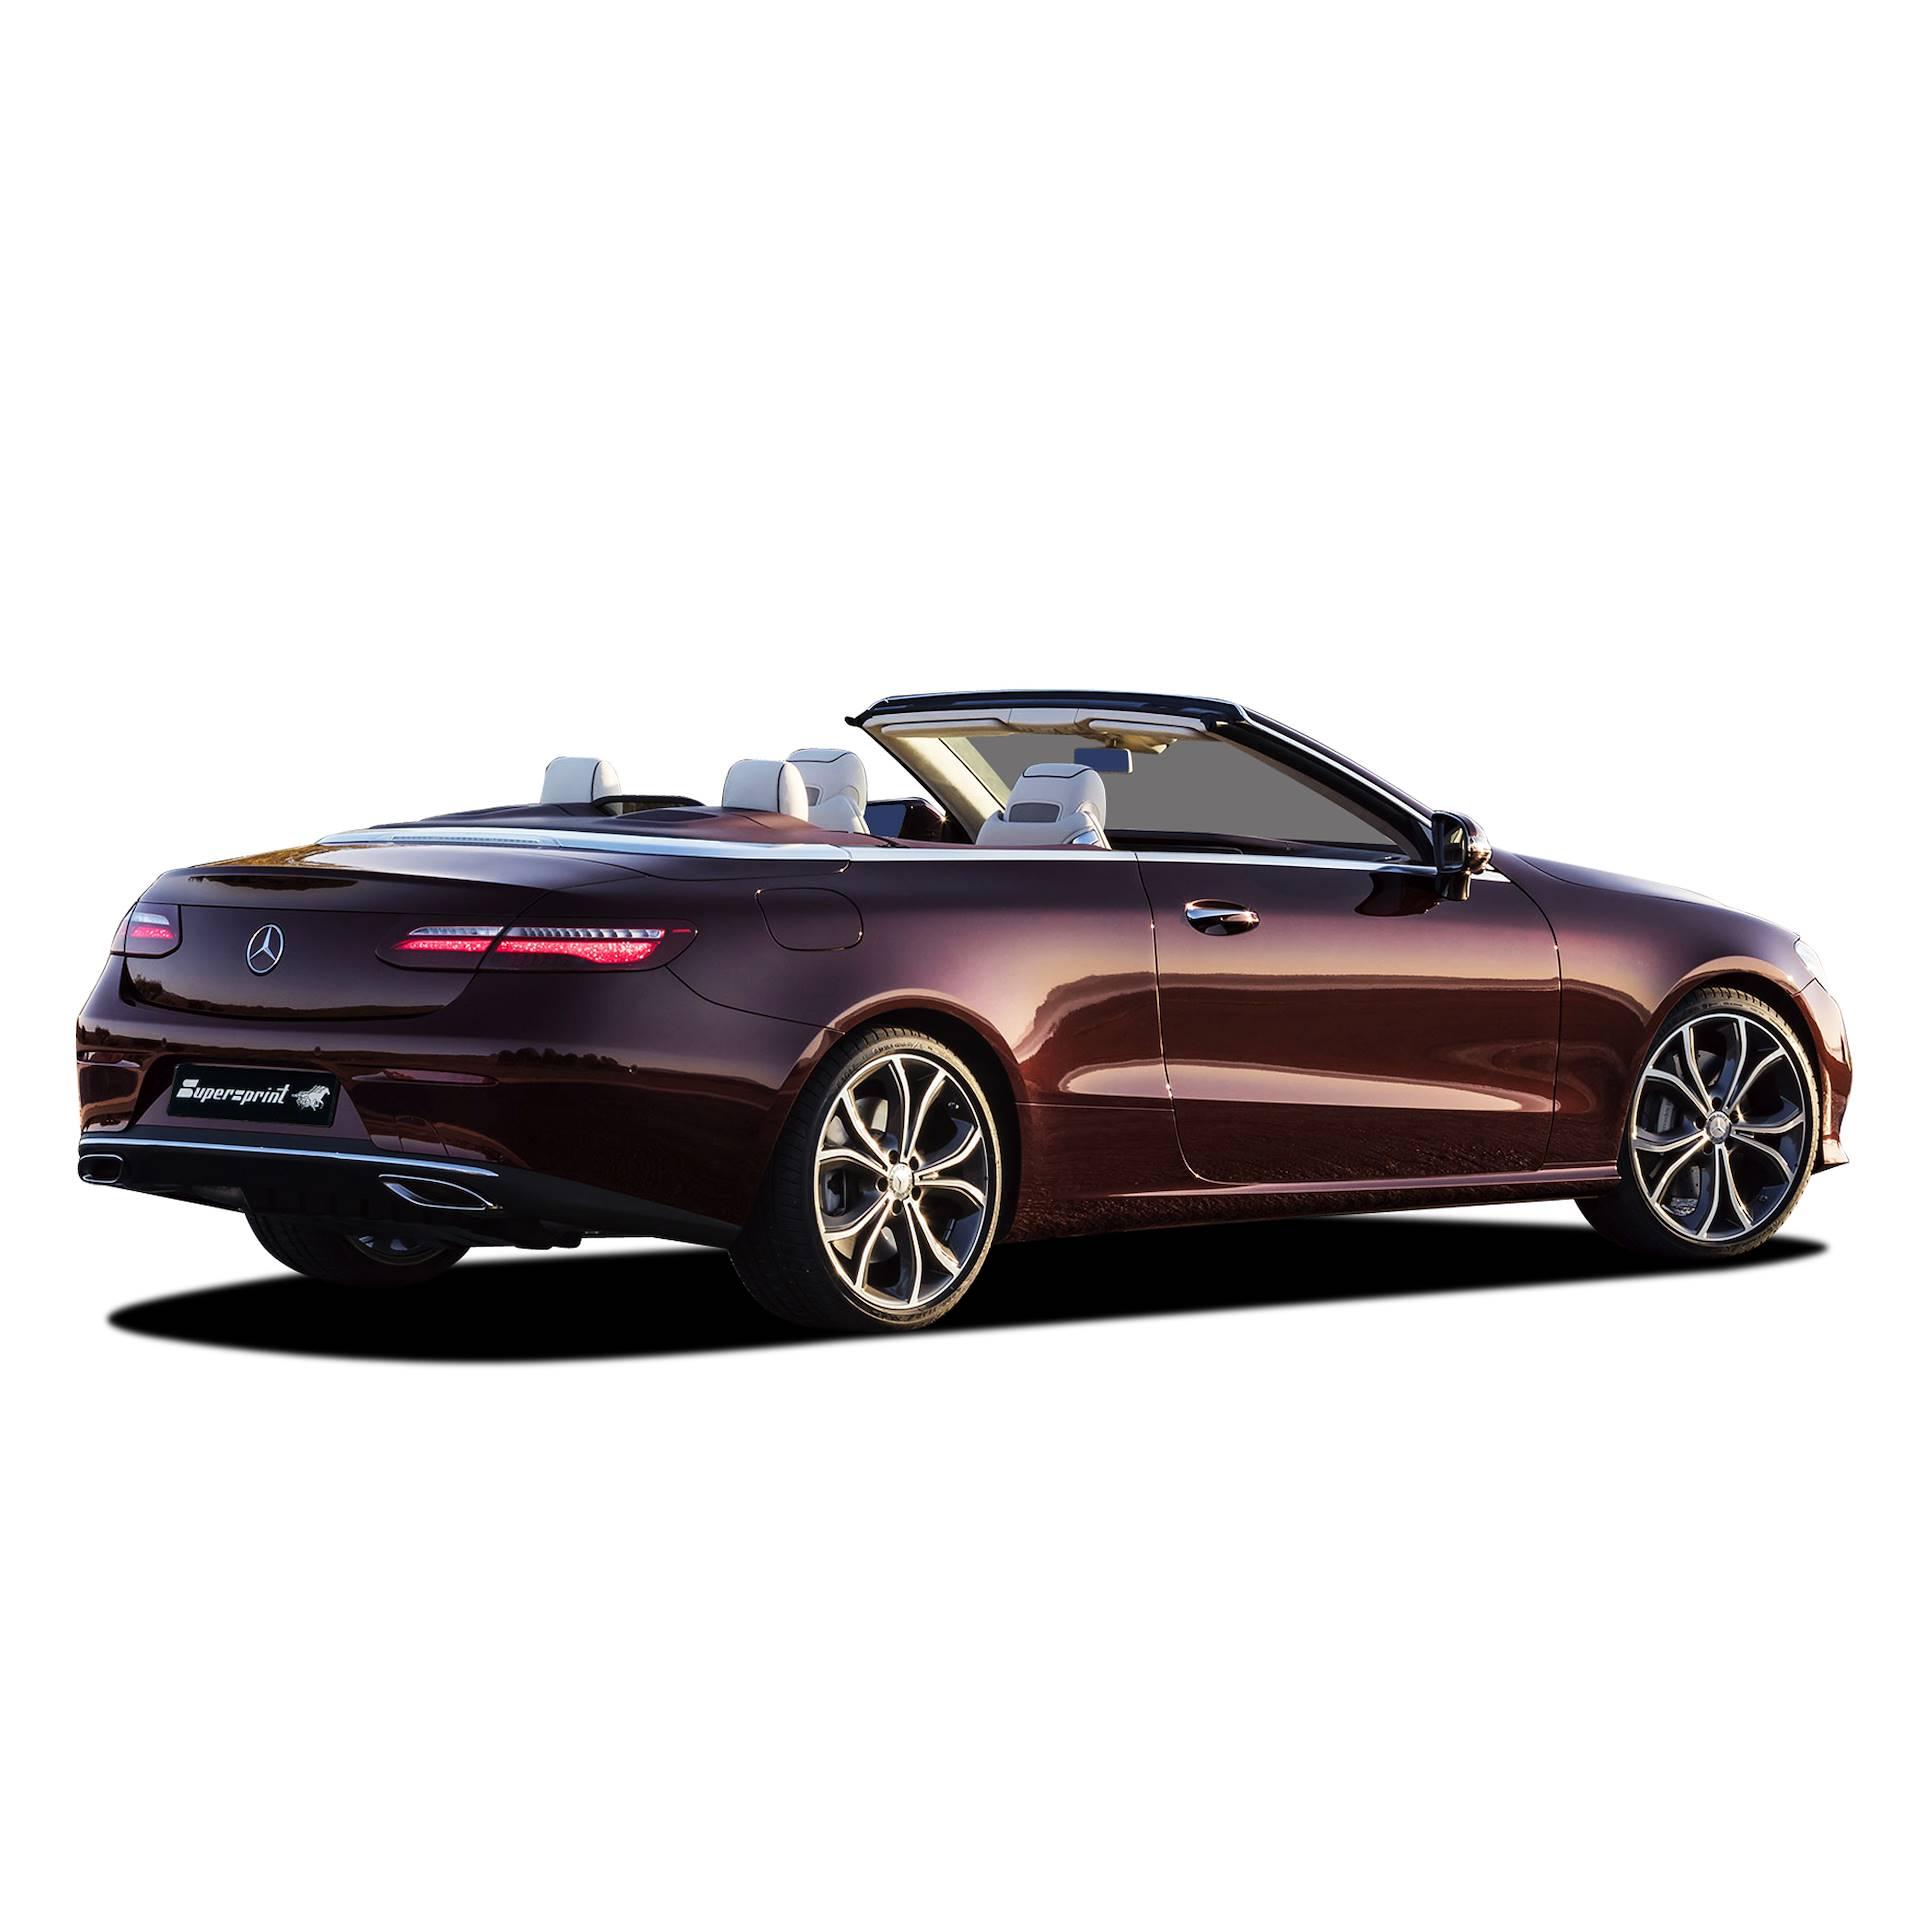 performance sport exhaust for mercedes a238 e 300 cabrio. Black Bedroom Furniture Sets. Home Design Ideas